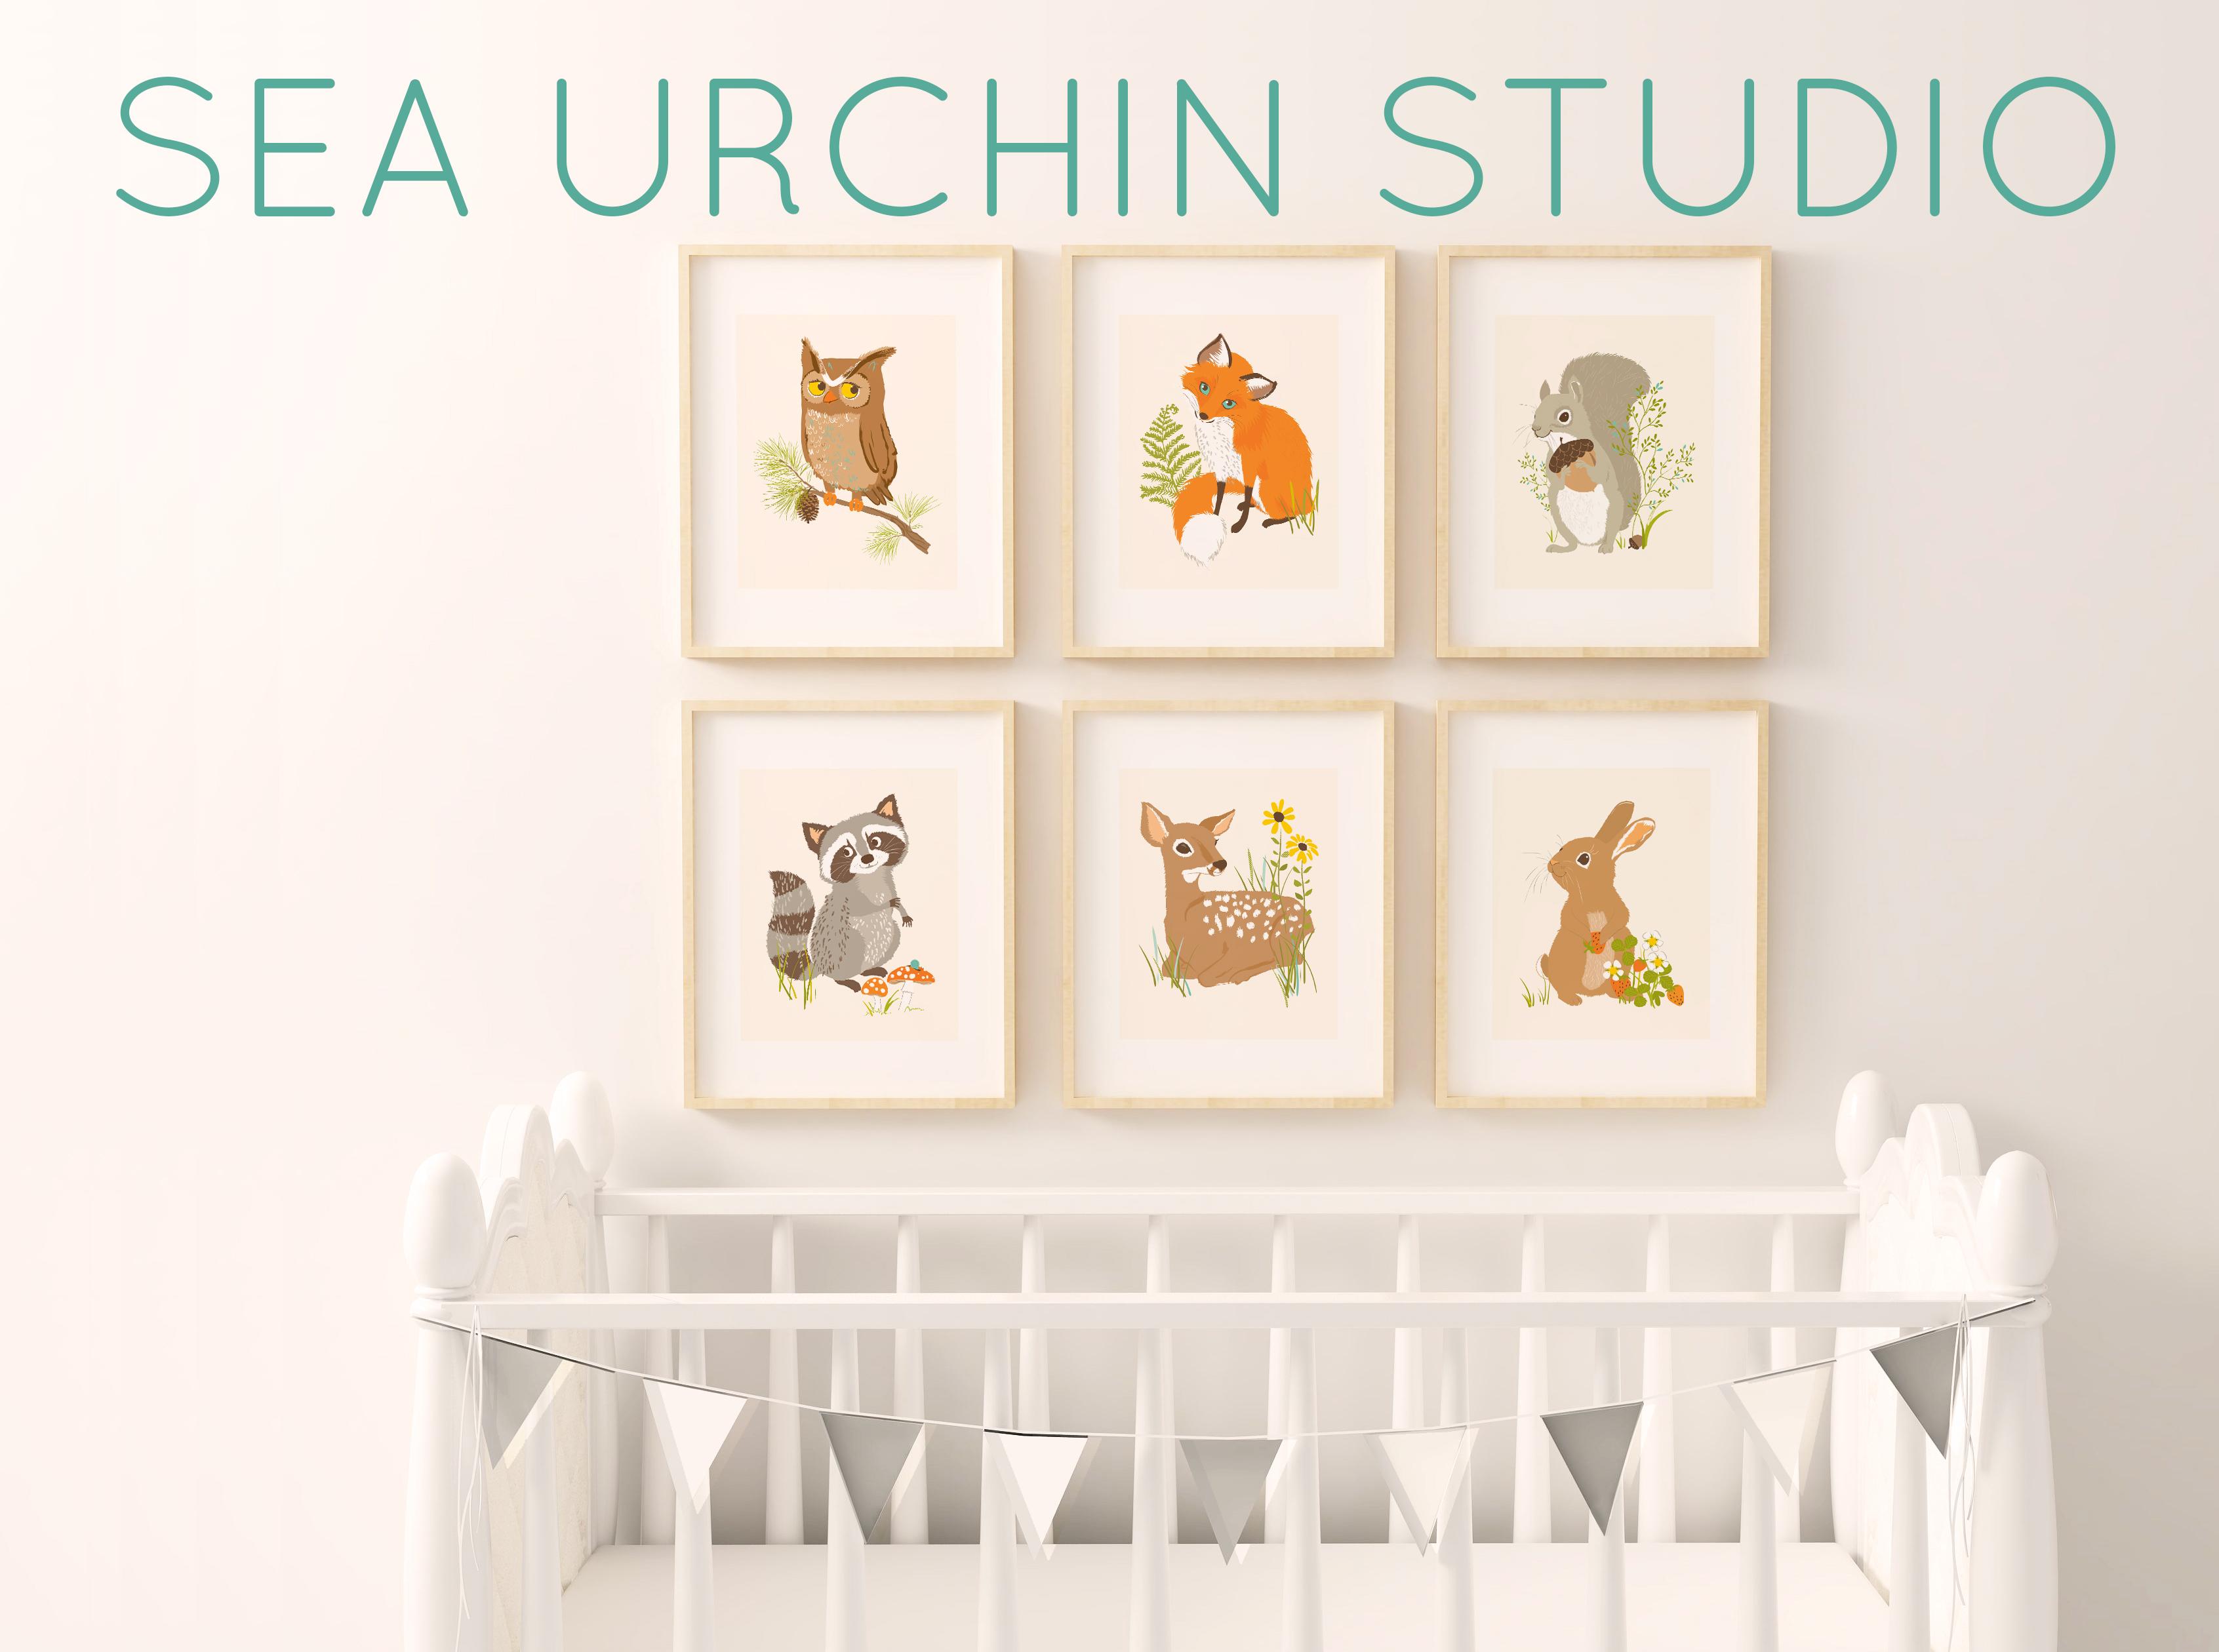 Sea Urchin Studio